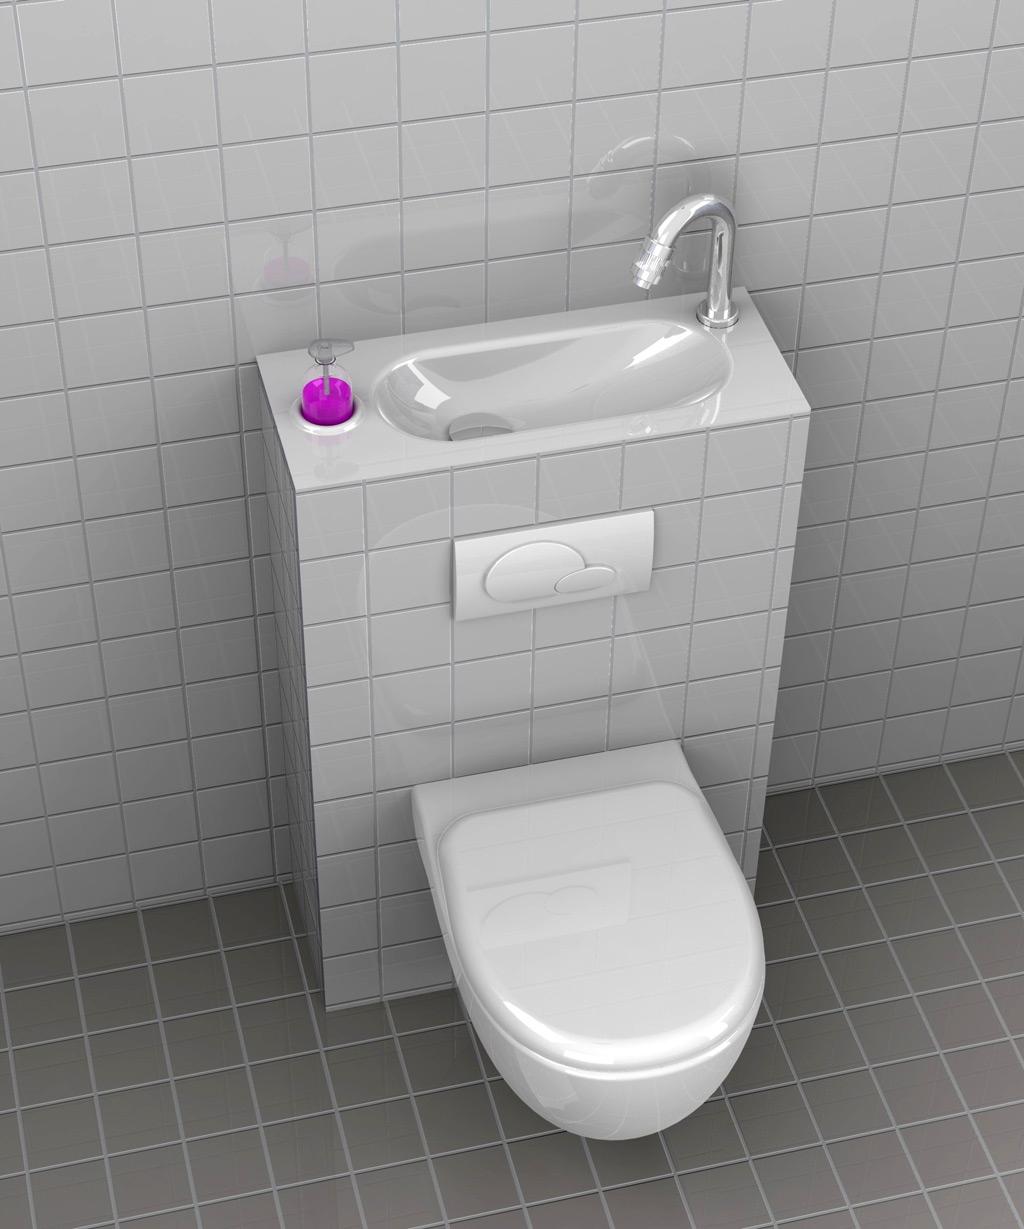 Robinet Castorama Salle De Bain Unique Image Lave Main Wc Castorama toilette Suspendu Avec Lave Main Intgr Cheap